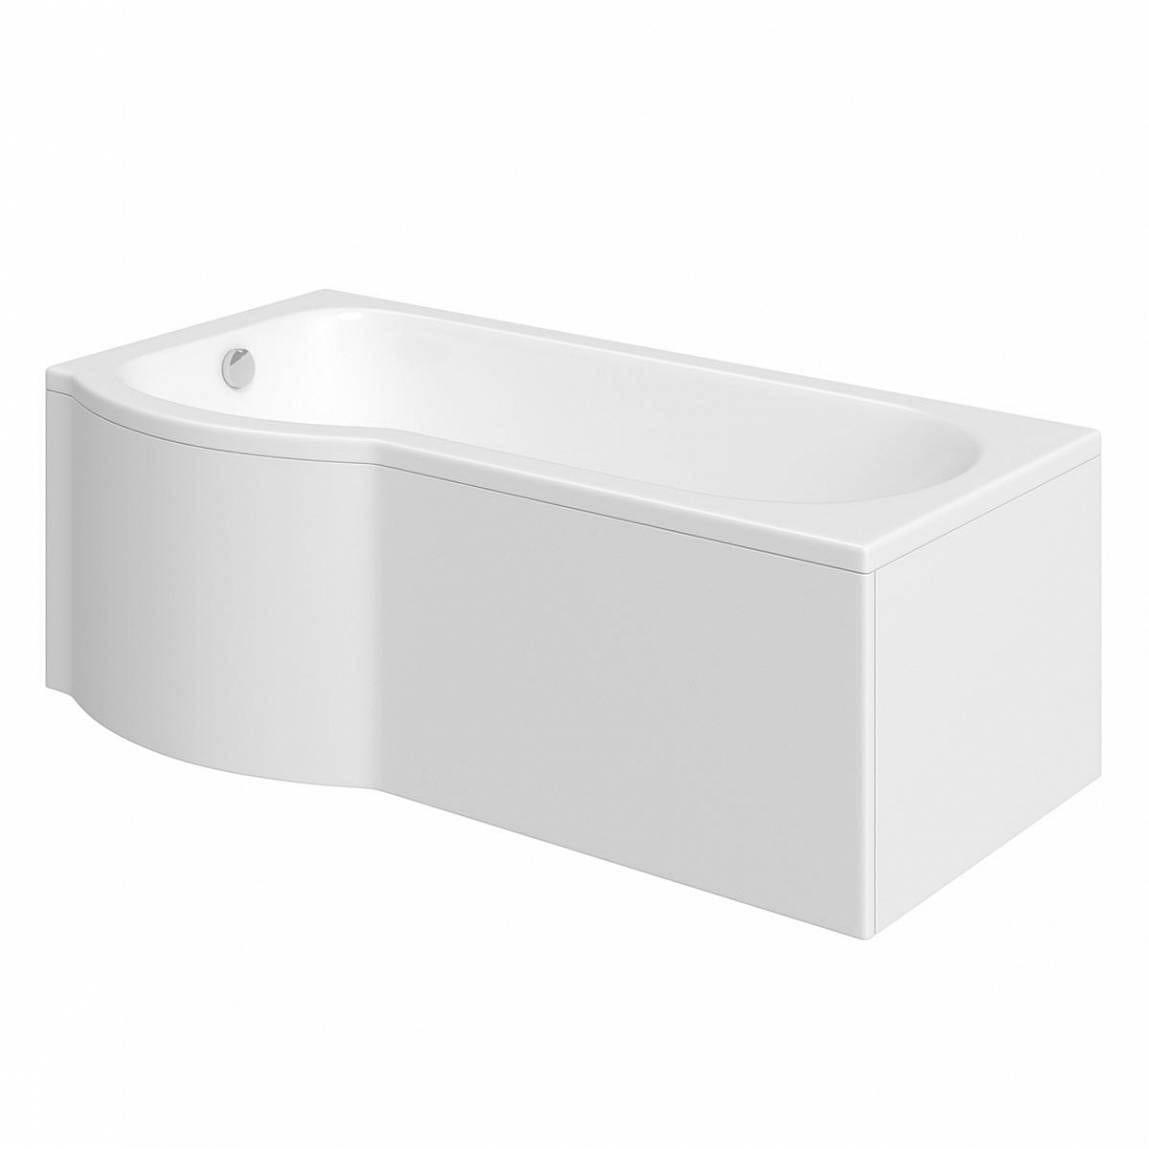 Bathroom sink dimensions mm - P Shaped Left Handed Shower Bath 1500 X 800